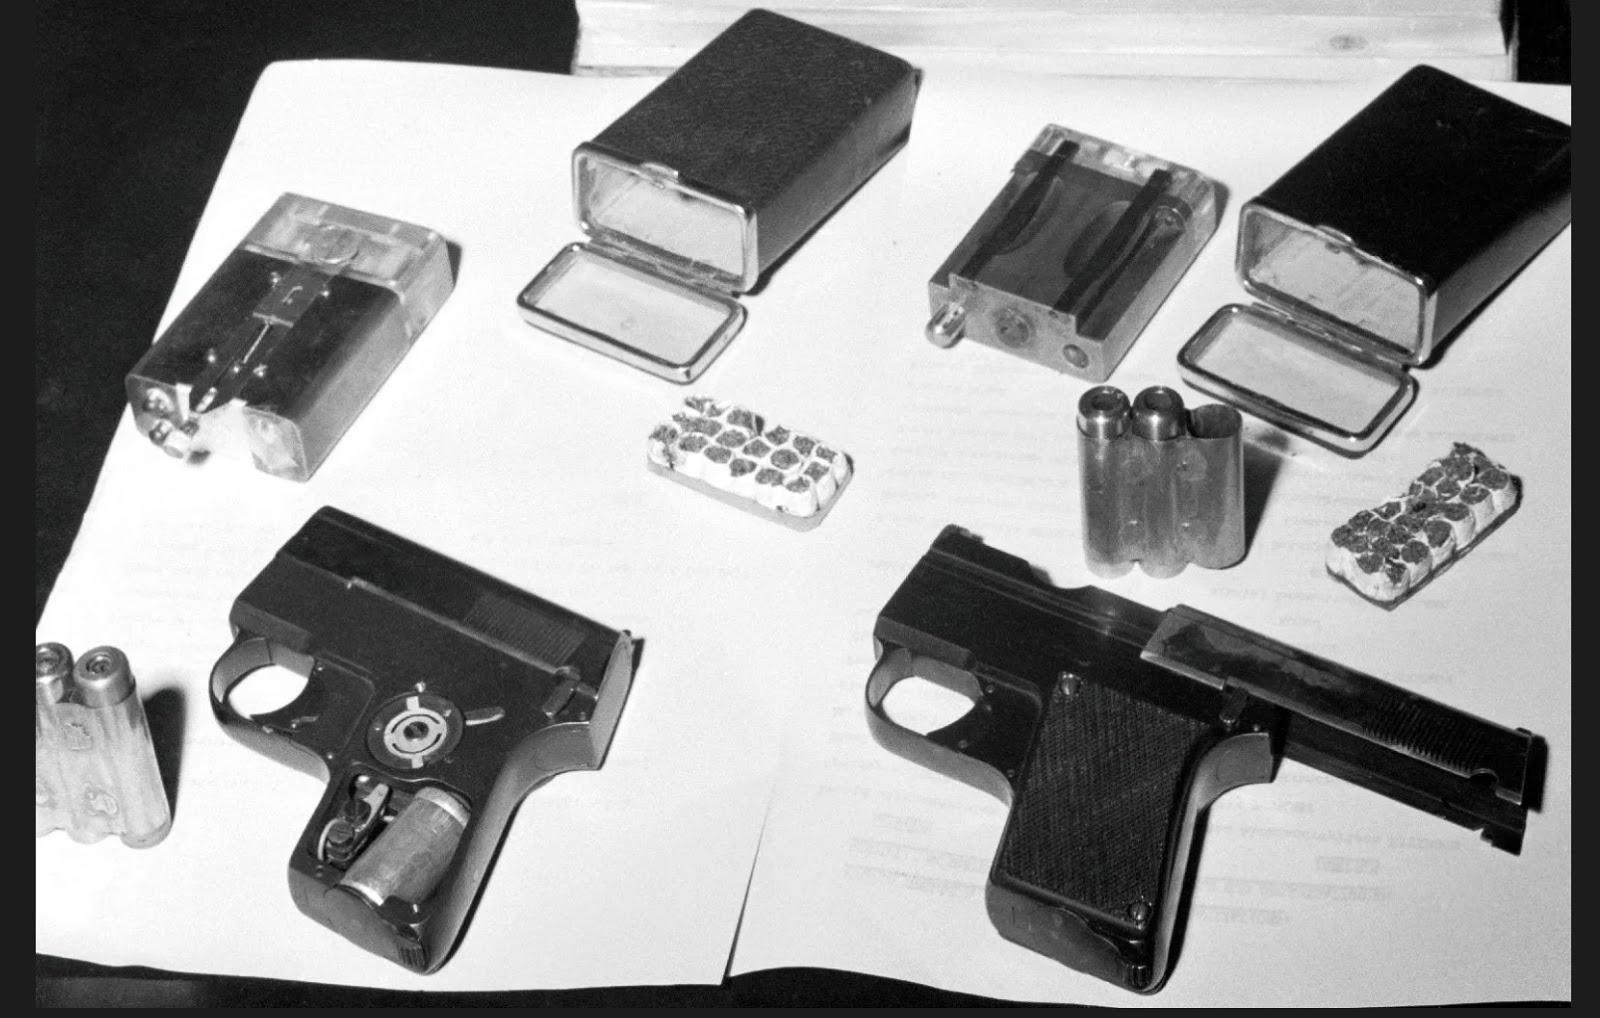 KGB Cold War Spy Gadgets